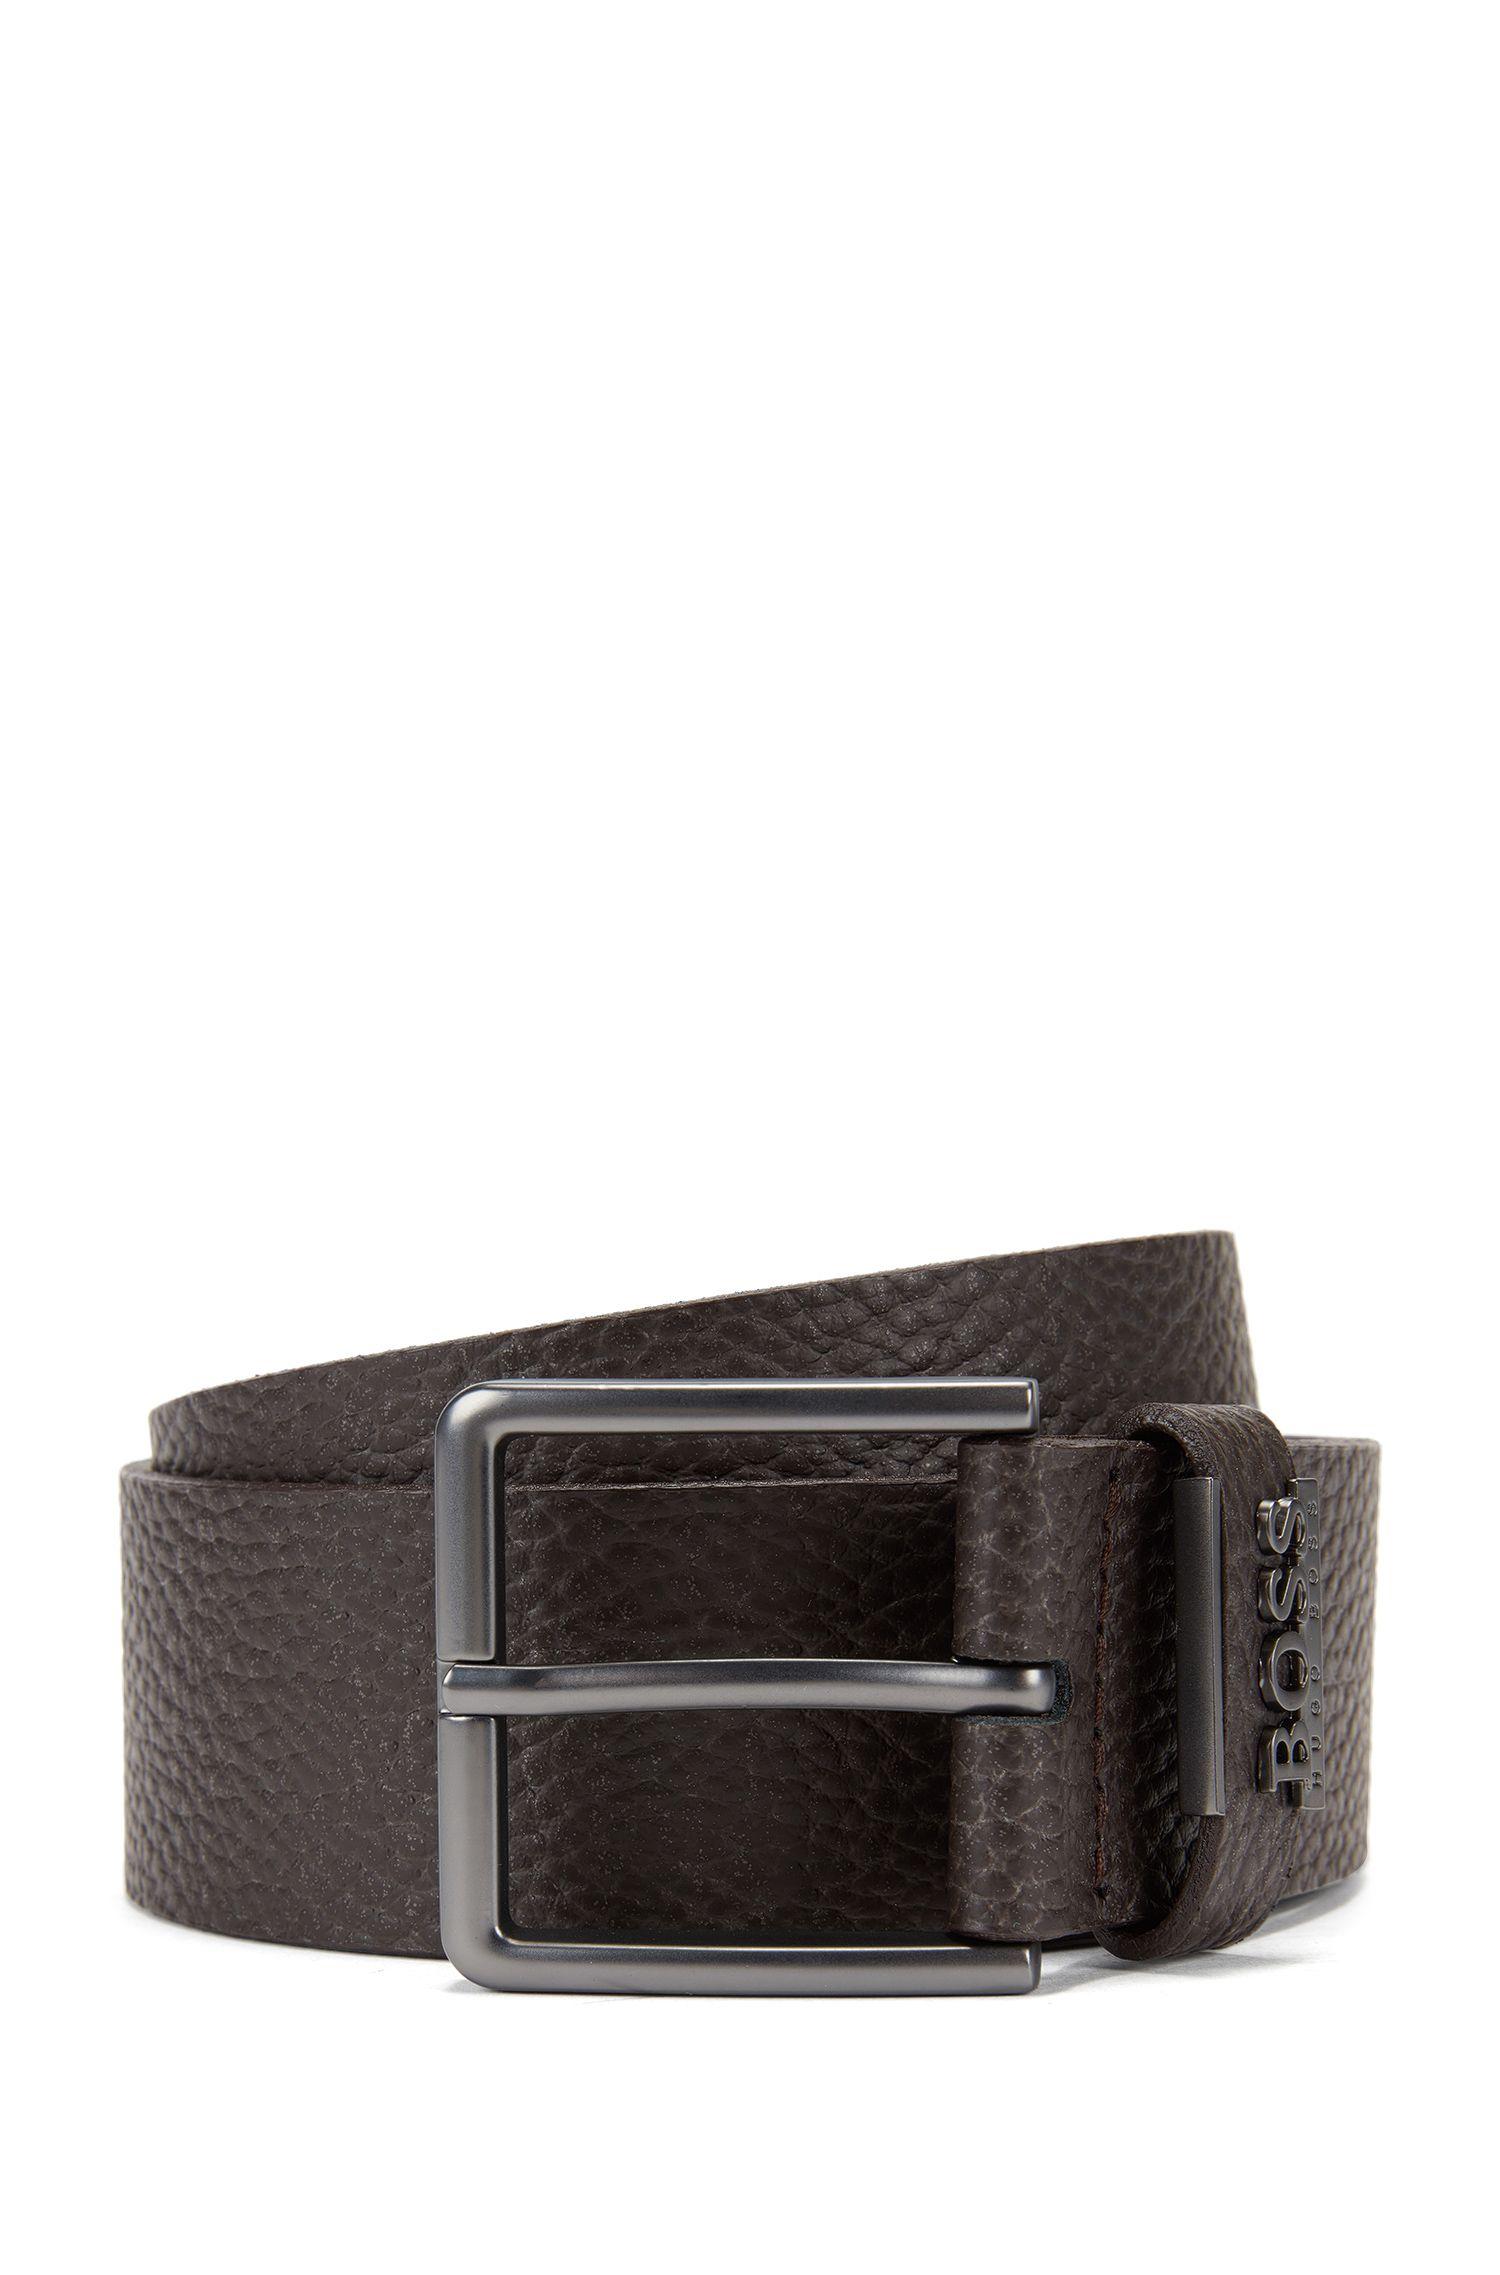 Grained-leather belt with matt gunmetal hardware